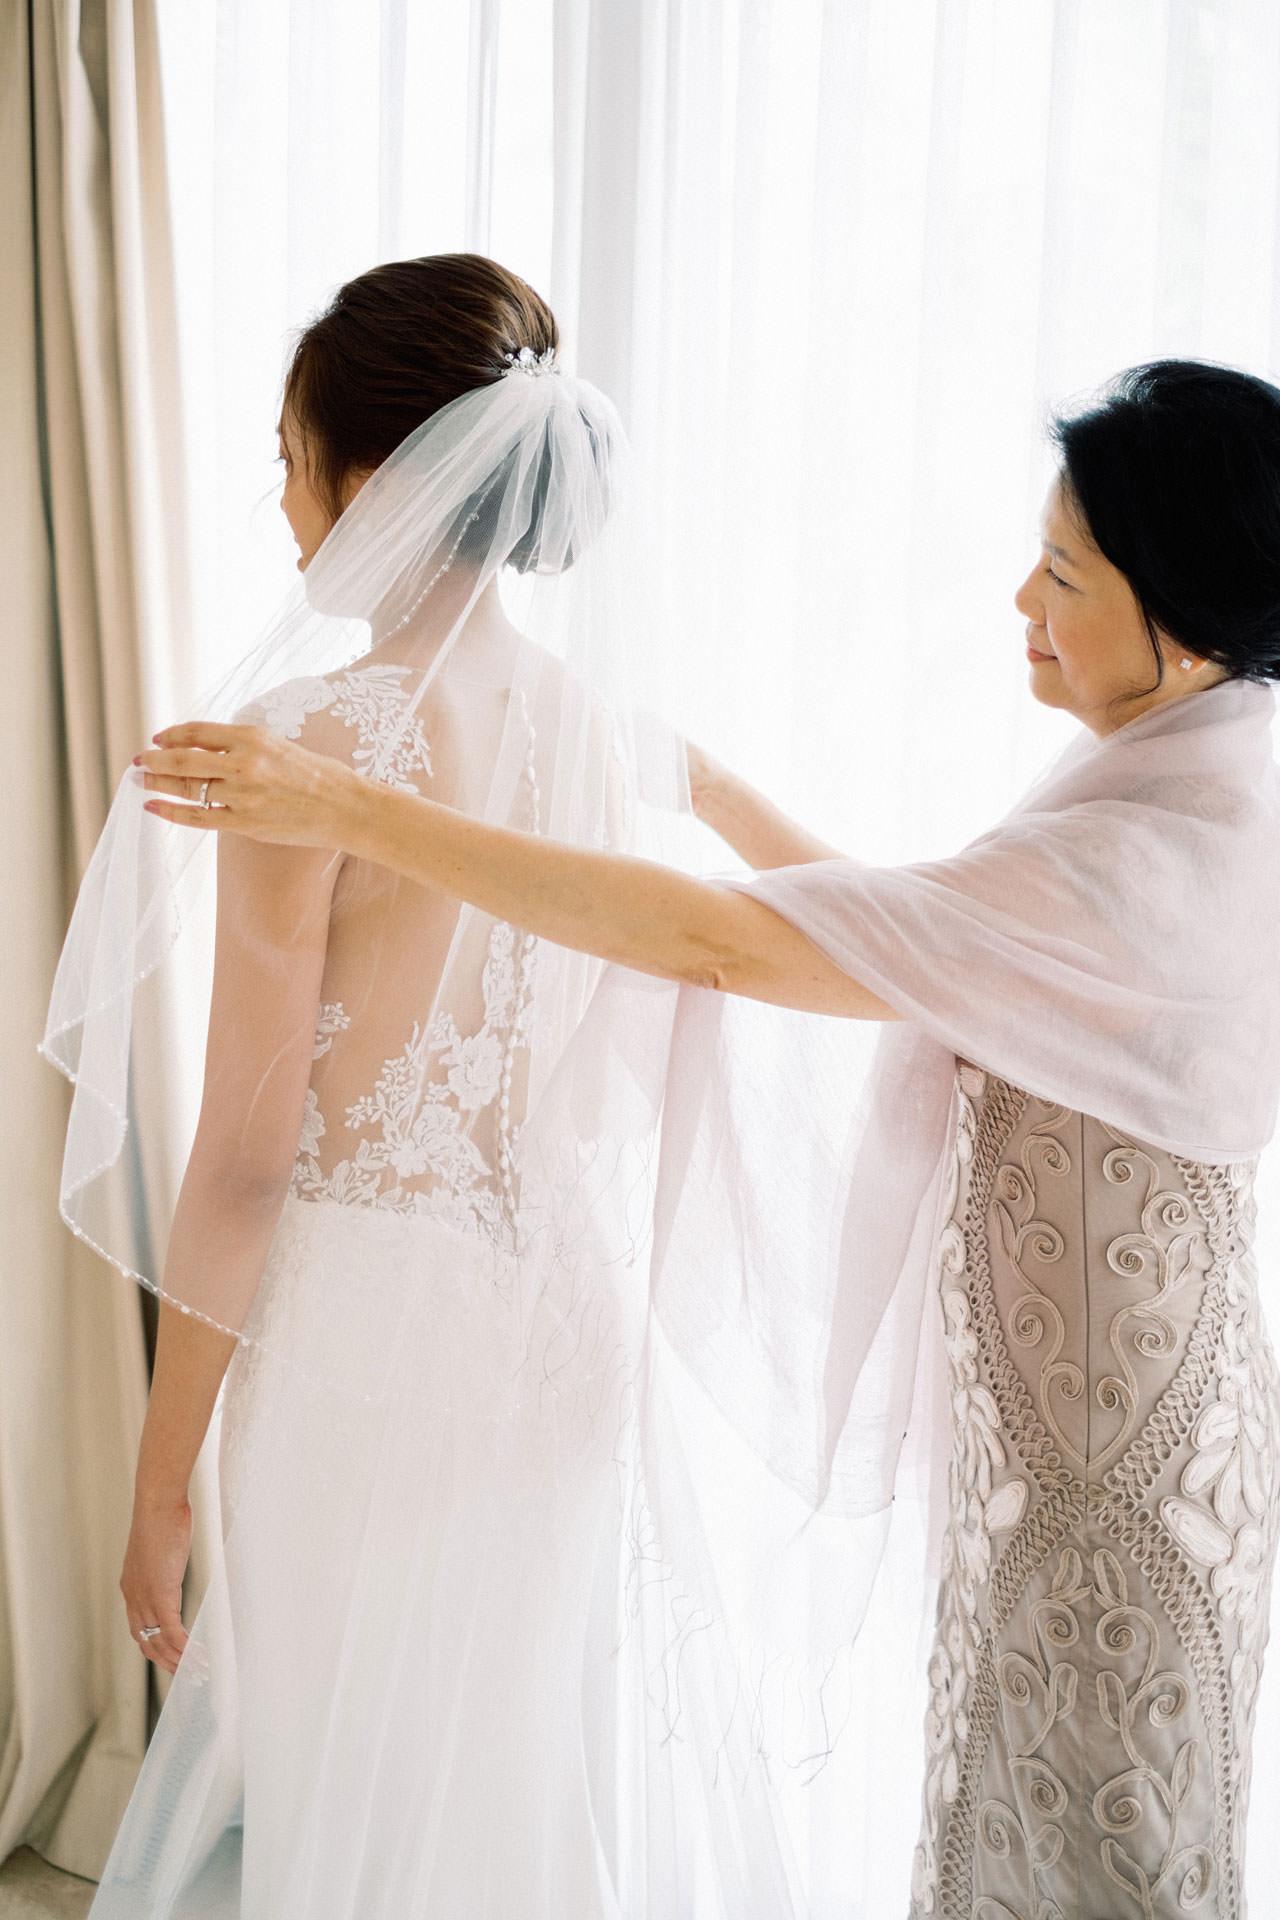 Uluwatu Cliff Wedding with Chinese Wedding Ceremony 18